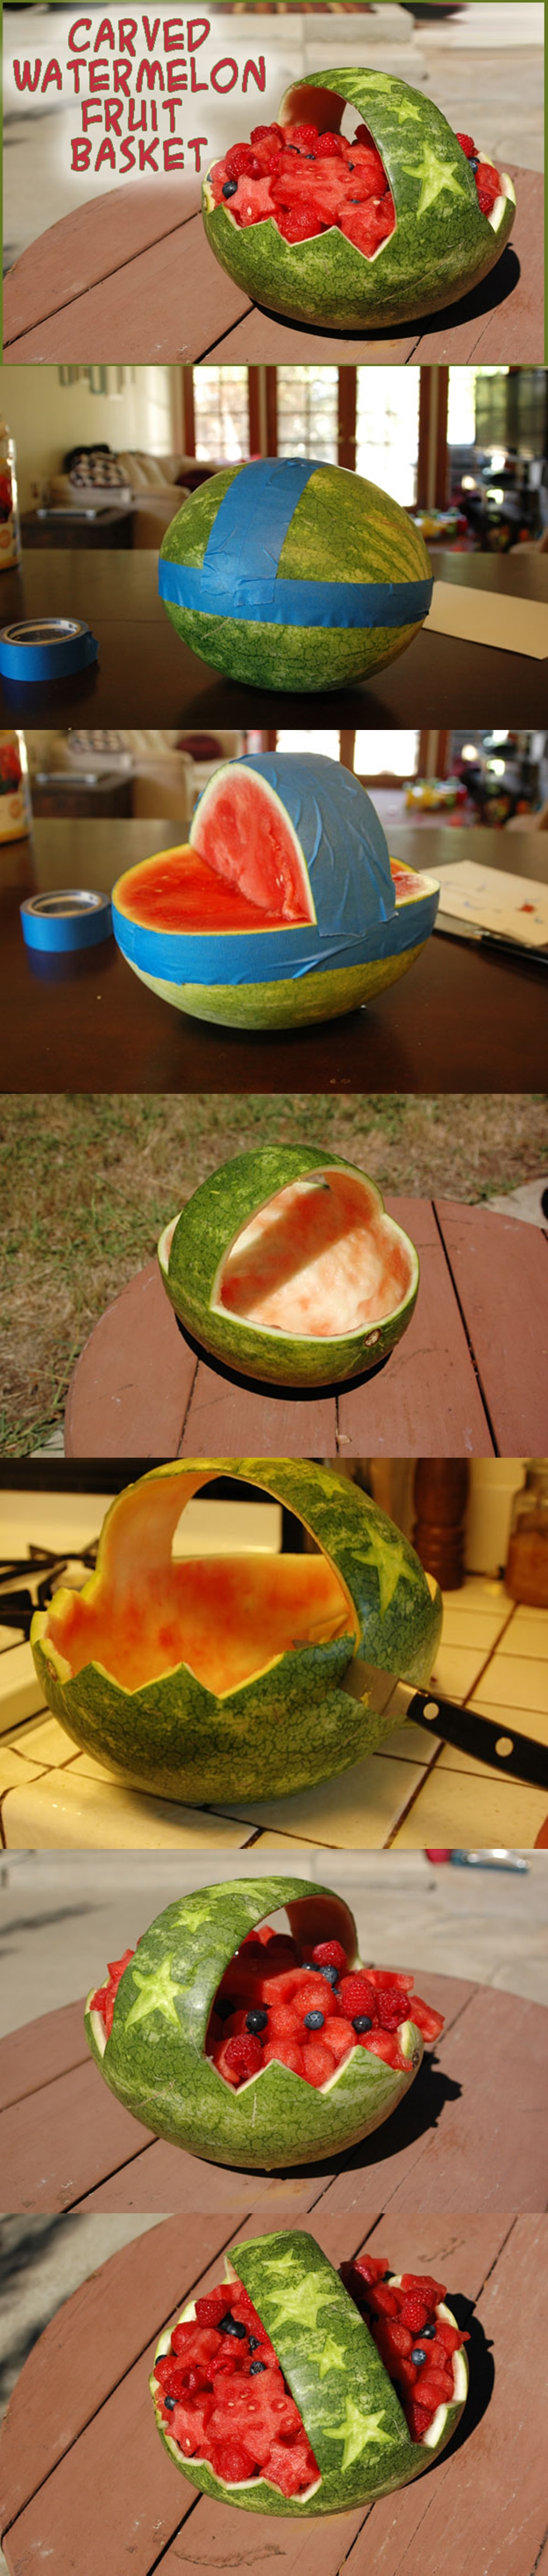 Carved Watermelon Fruit Basket